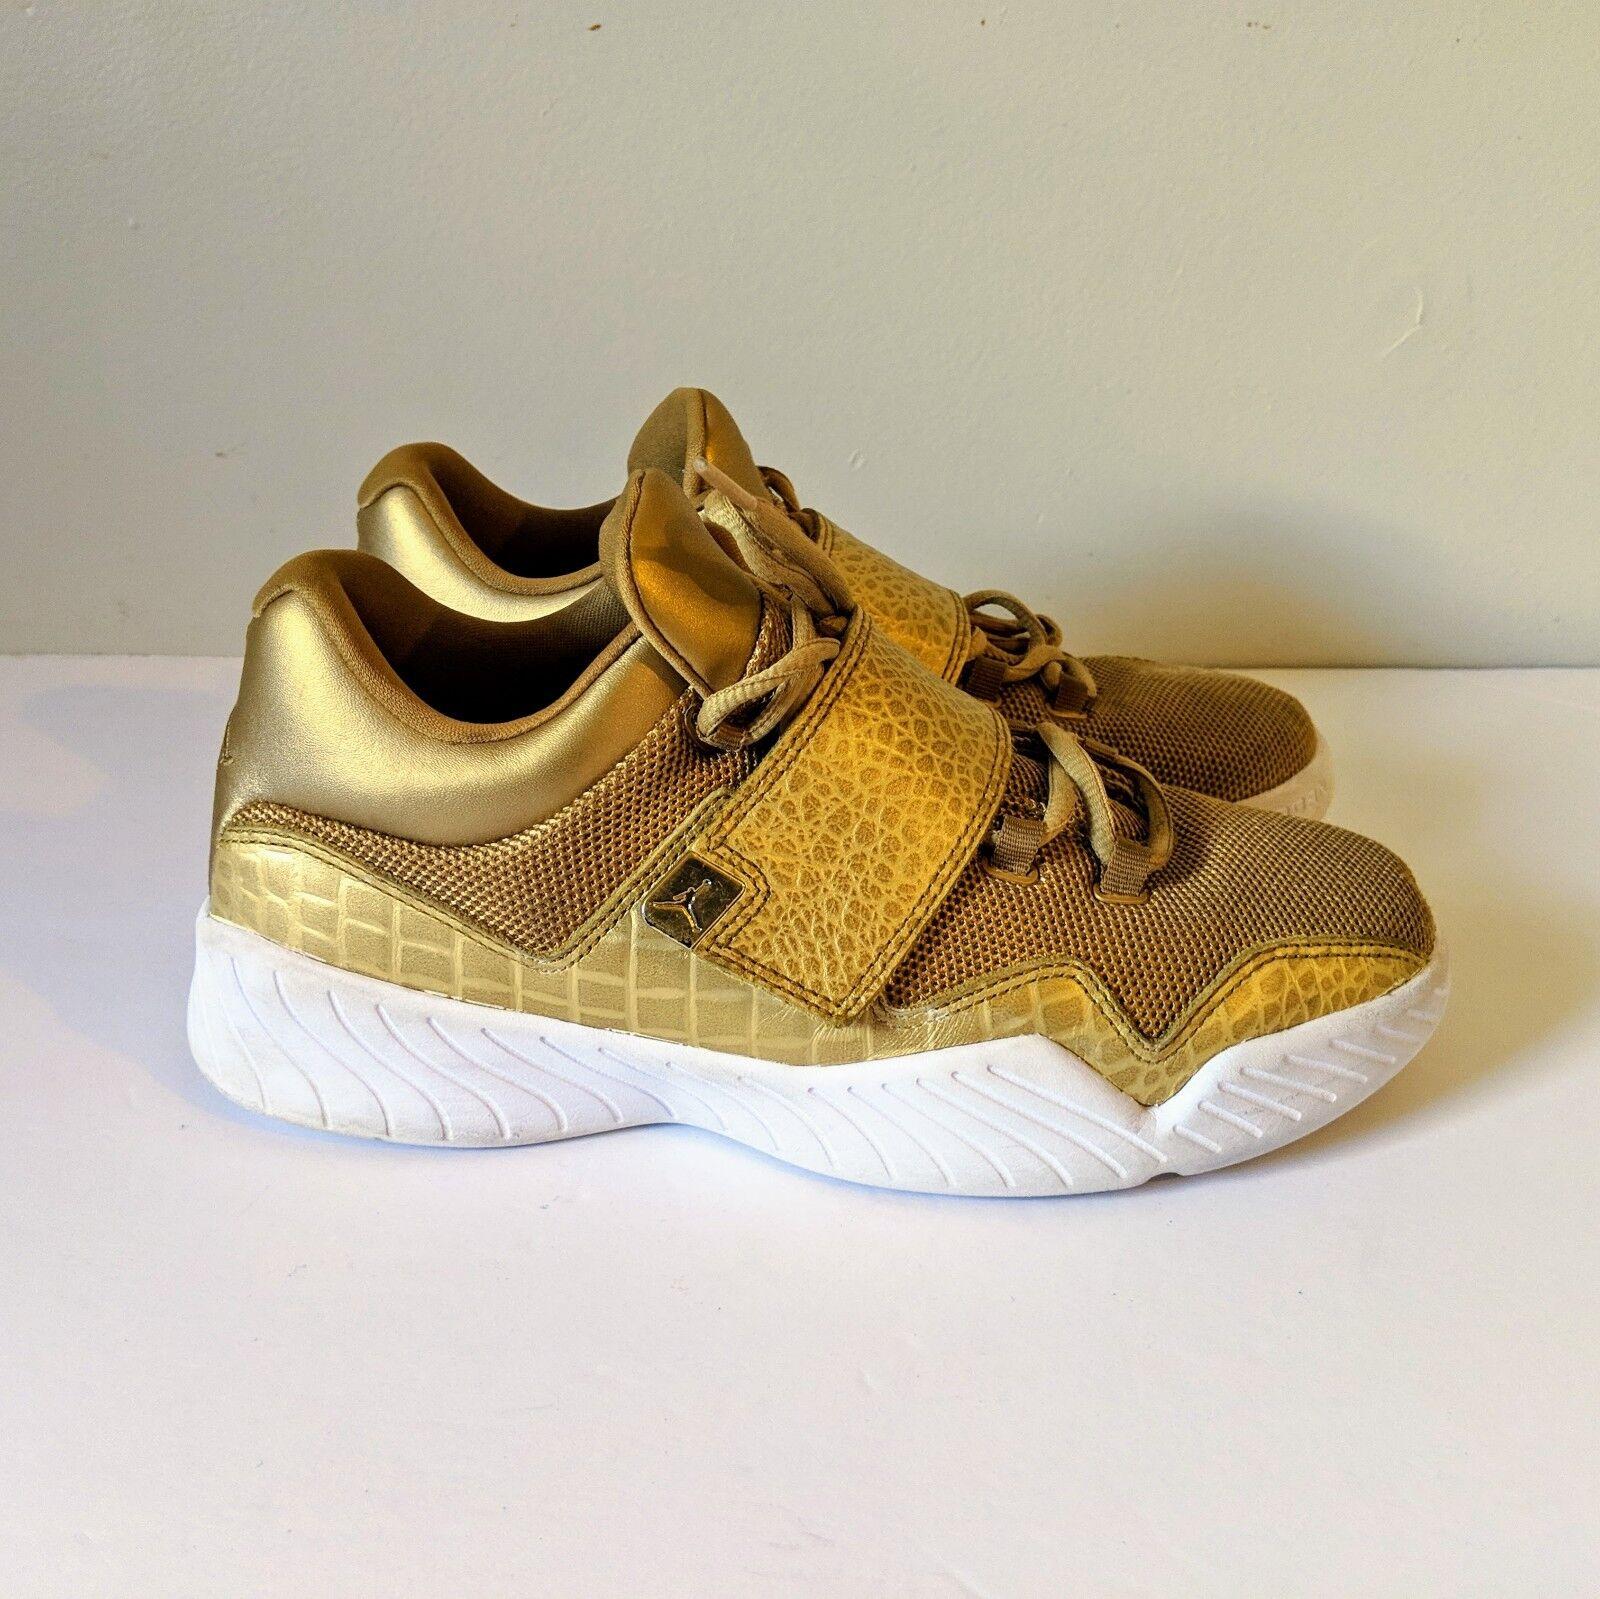 watch 23428 2ed17 Nike Air Jordan J23 Men s Basketball Sneakers 854557-700 shoes Size 8.5